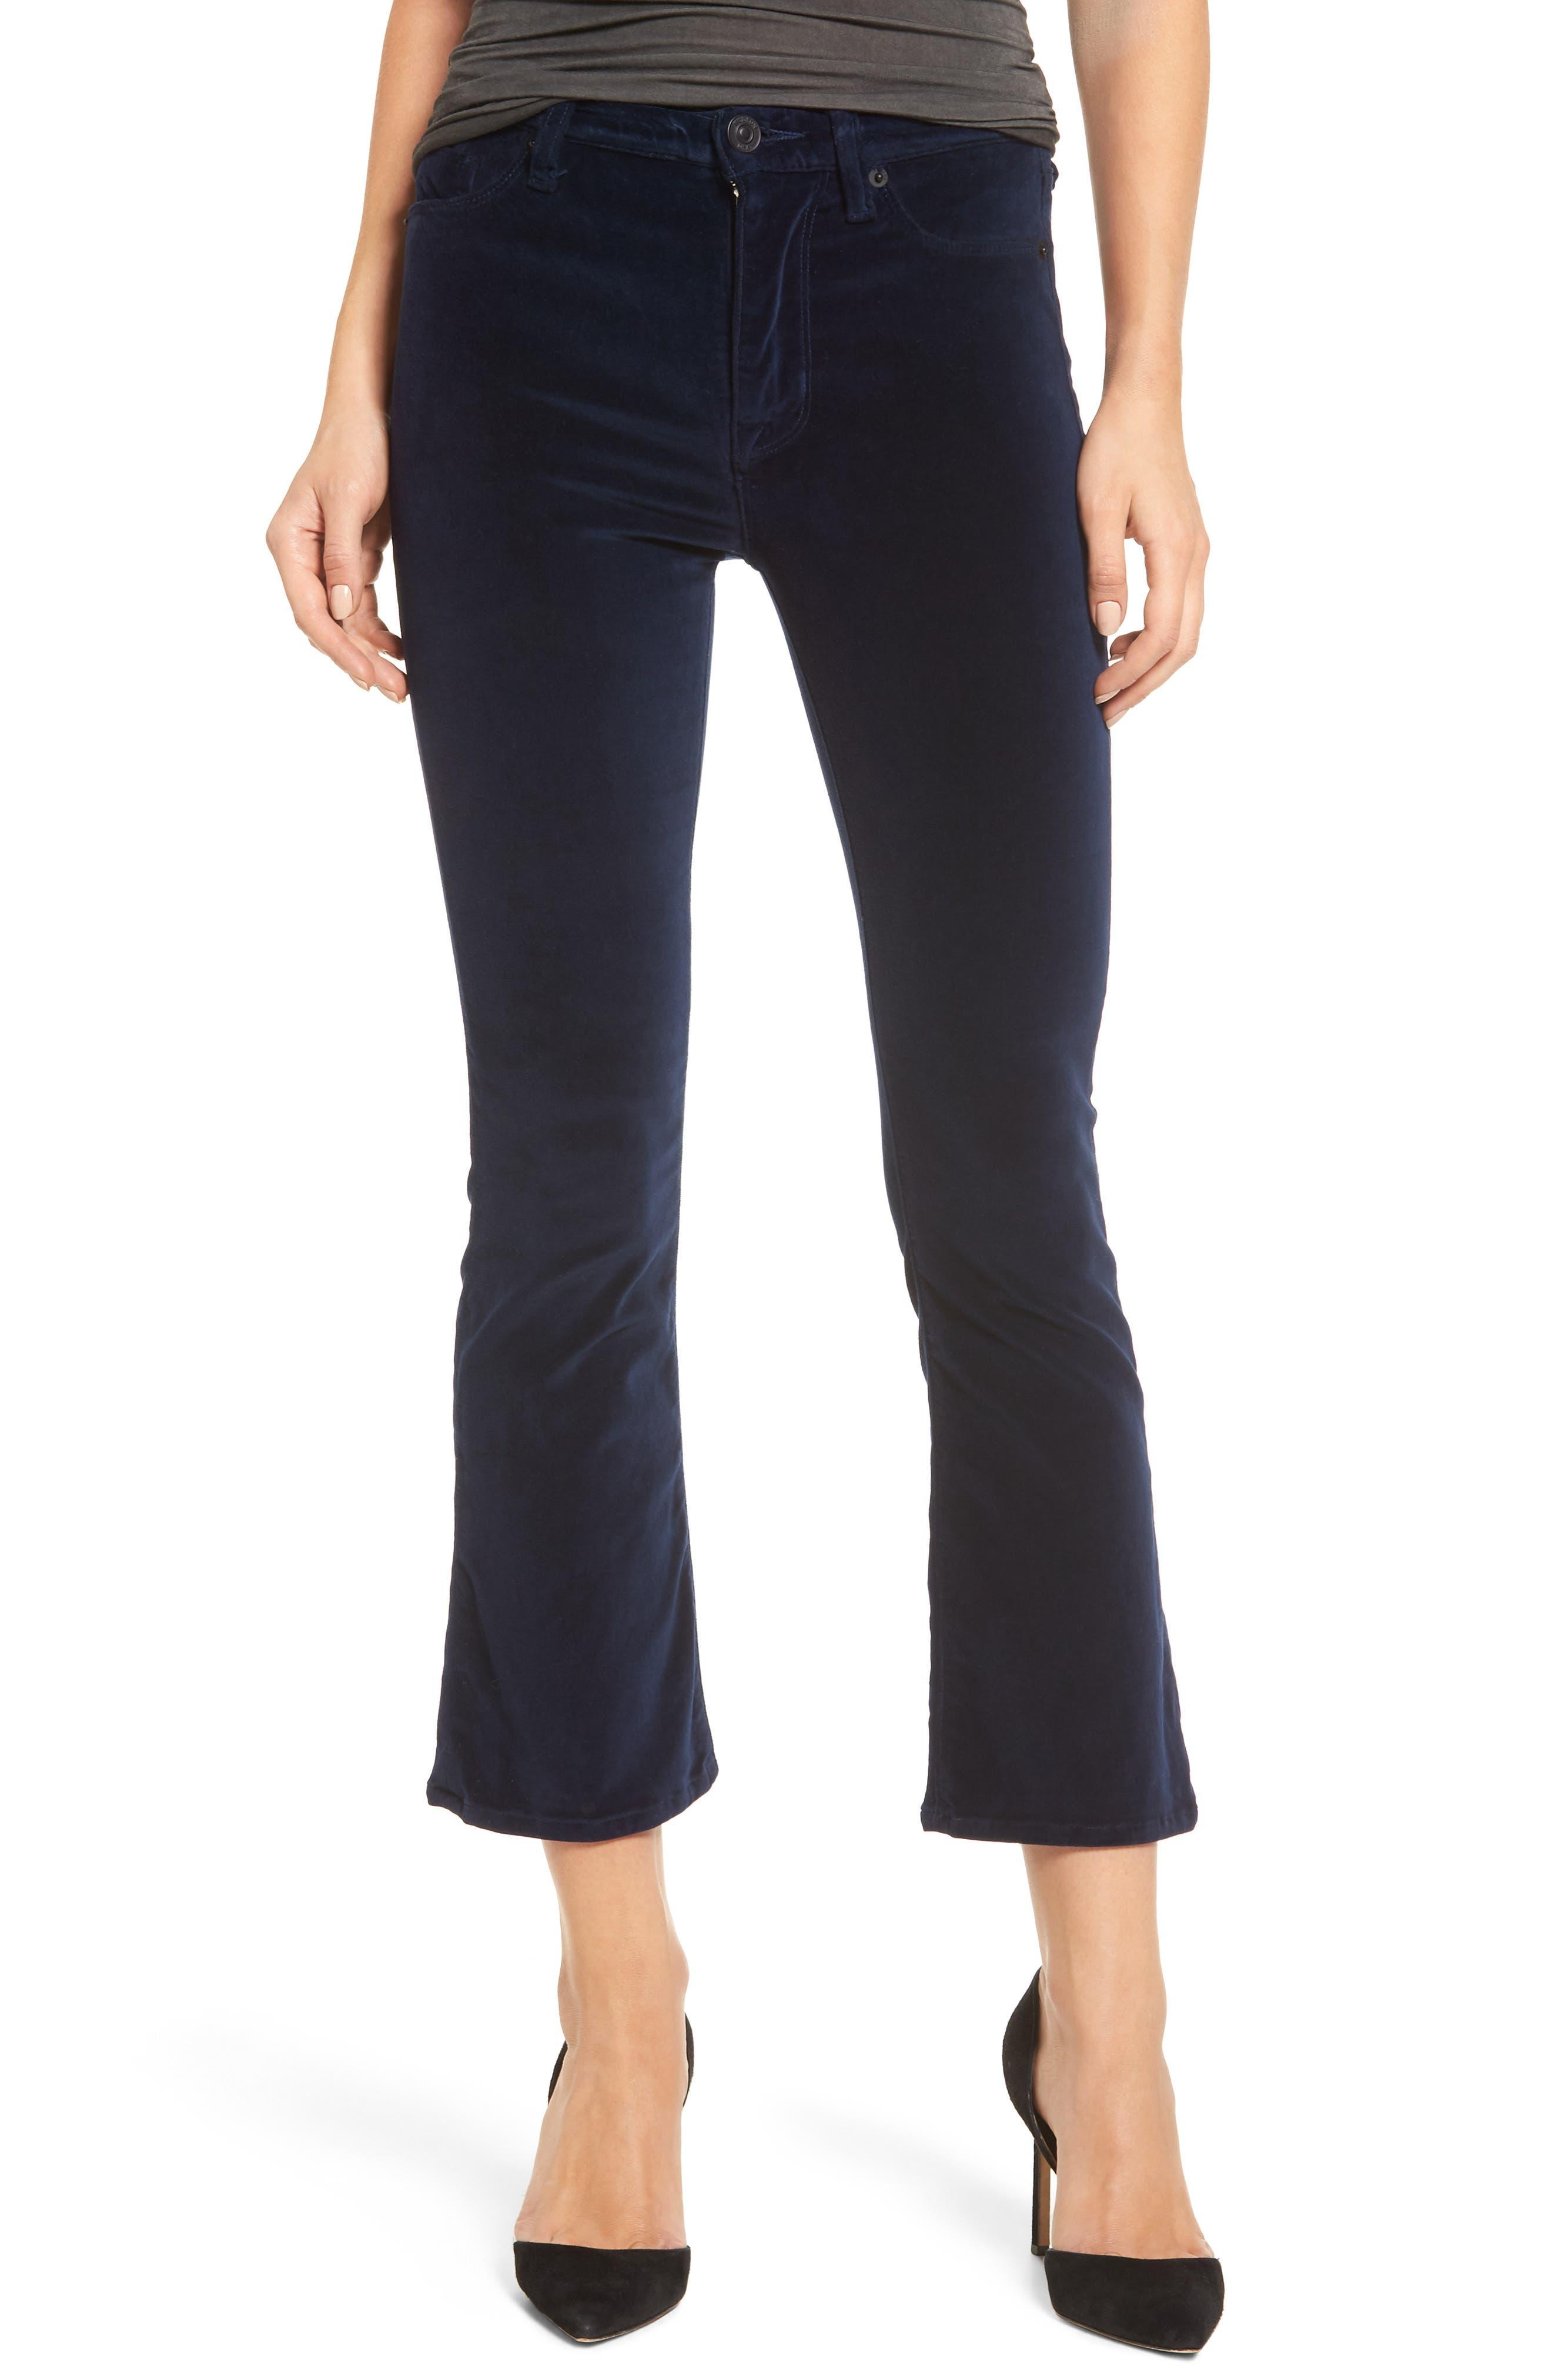 Brix Velvet High Waist Crop Bootcut Pants,                         Main,                         color, Dark Obsidian